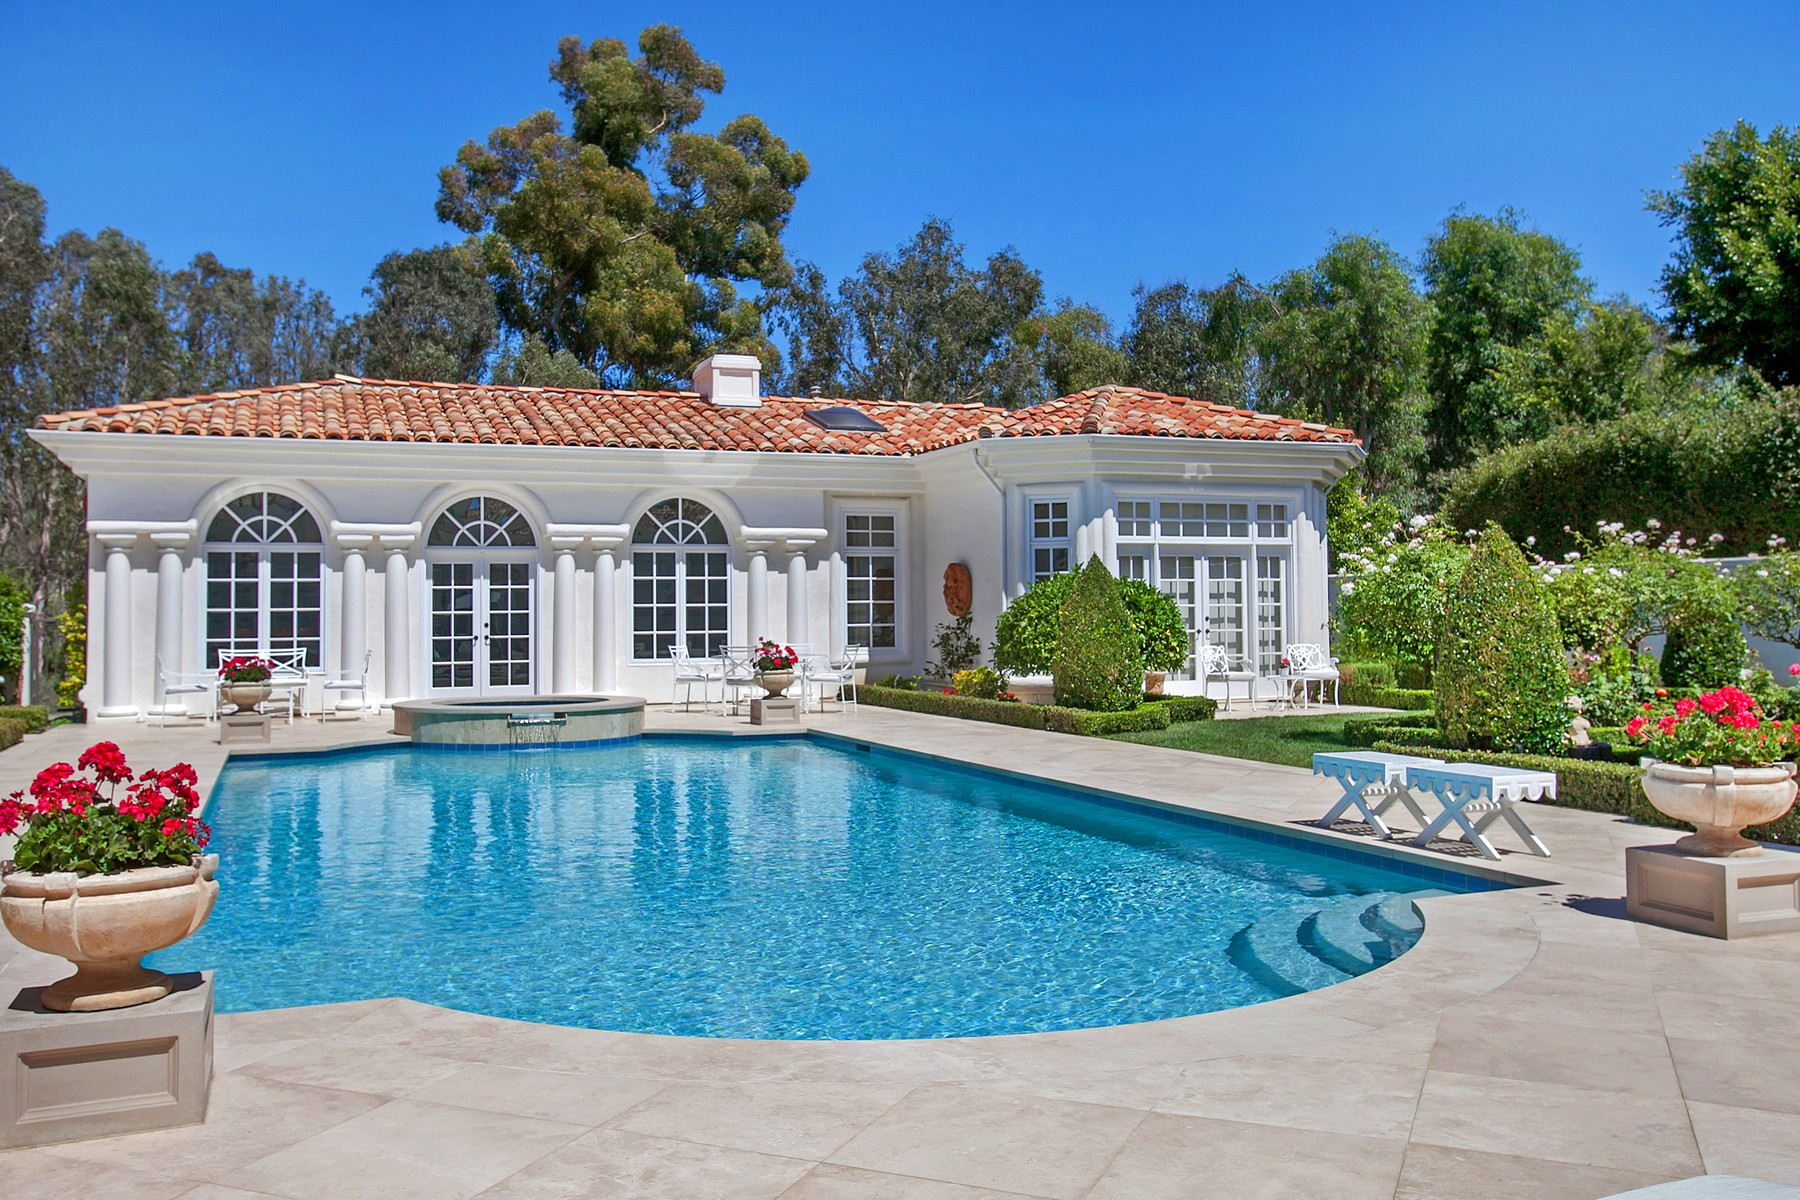 Additional photo for property listing at 16648 Circa Del Sur  Rancho Santa Fe, 加利福尼亚州 92067 美国